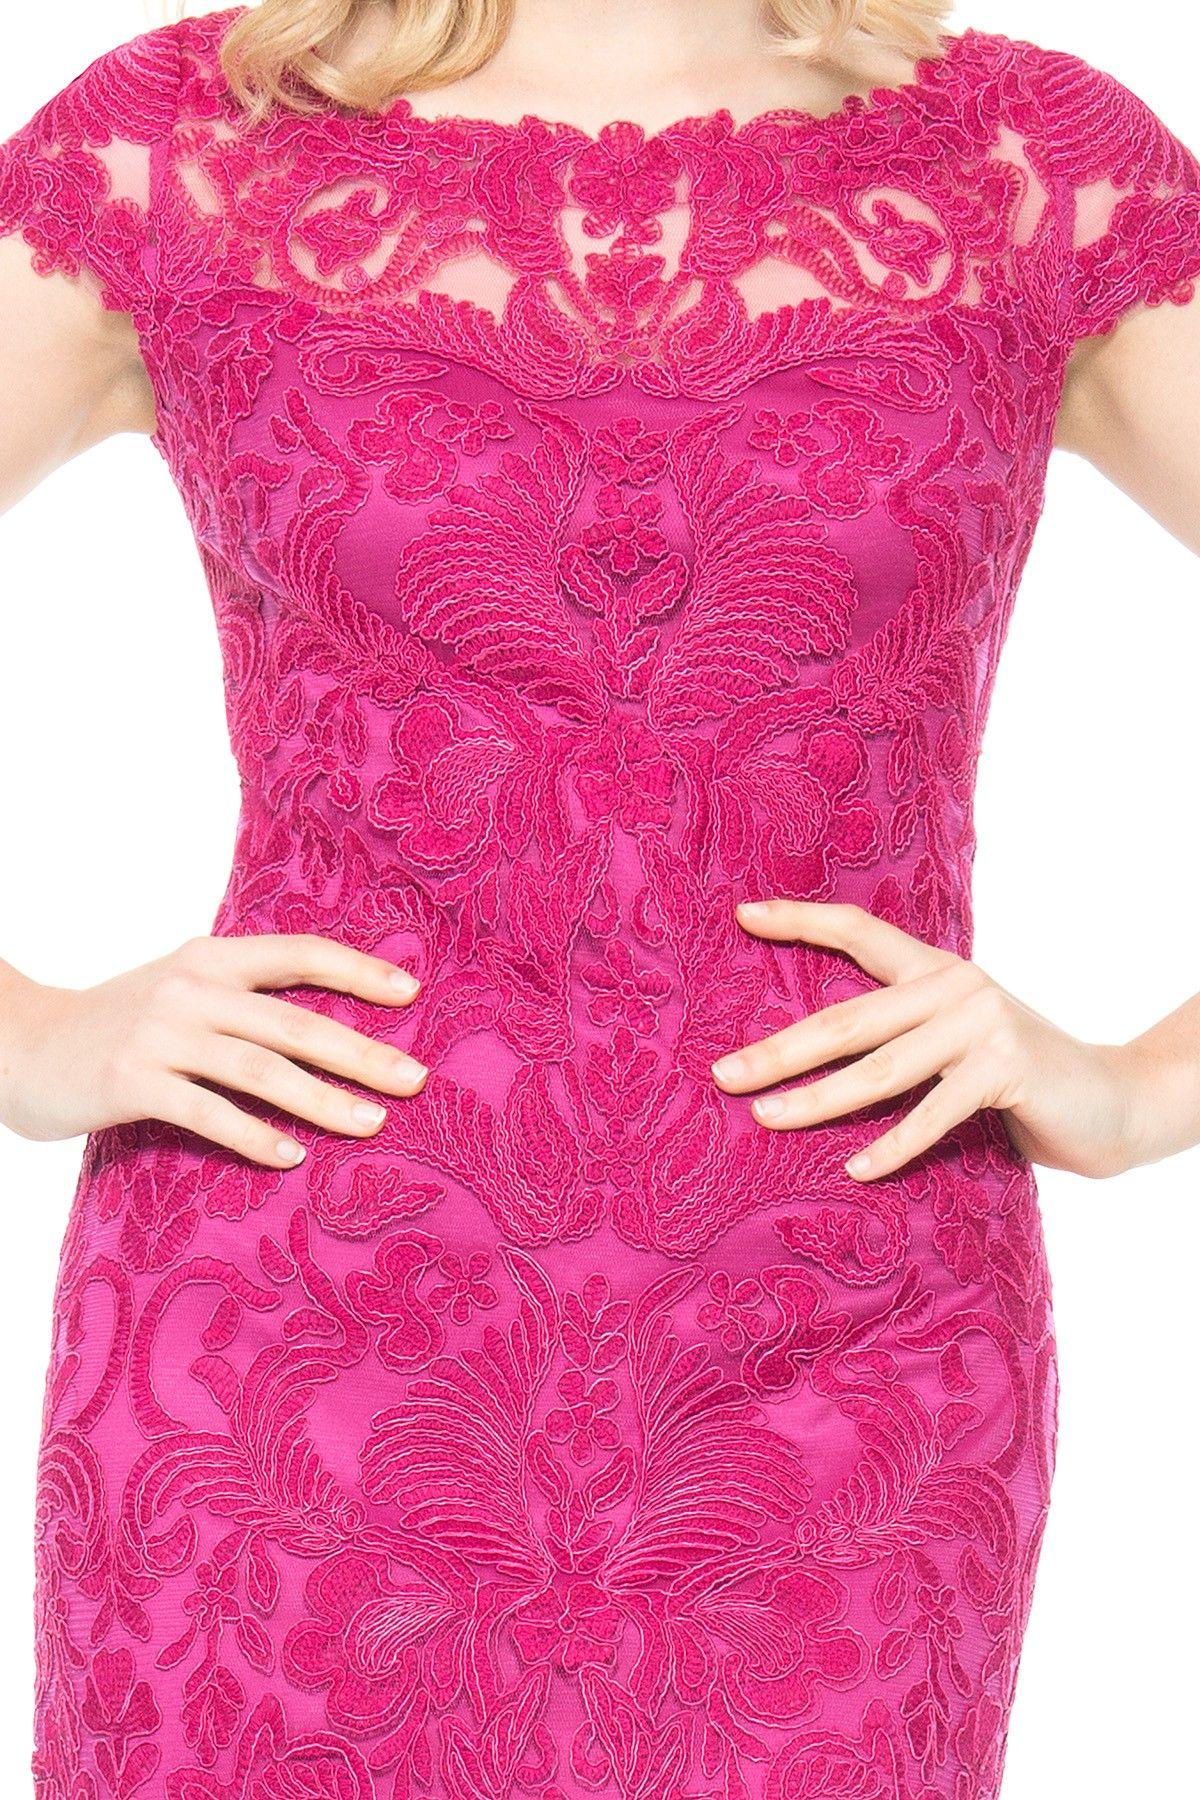 Ceremony Wedding Dress - Embroidery on Tulle Cap Sleeve Gown | Tadashi Shoji